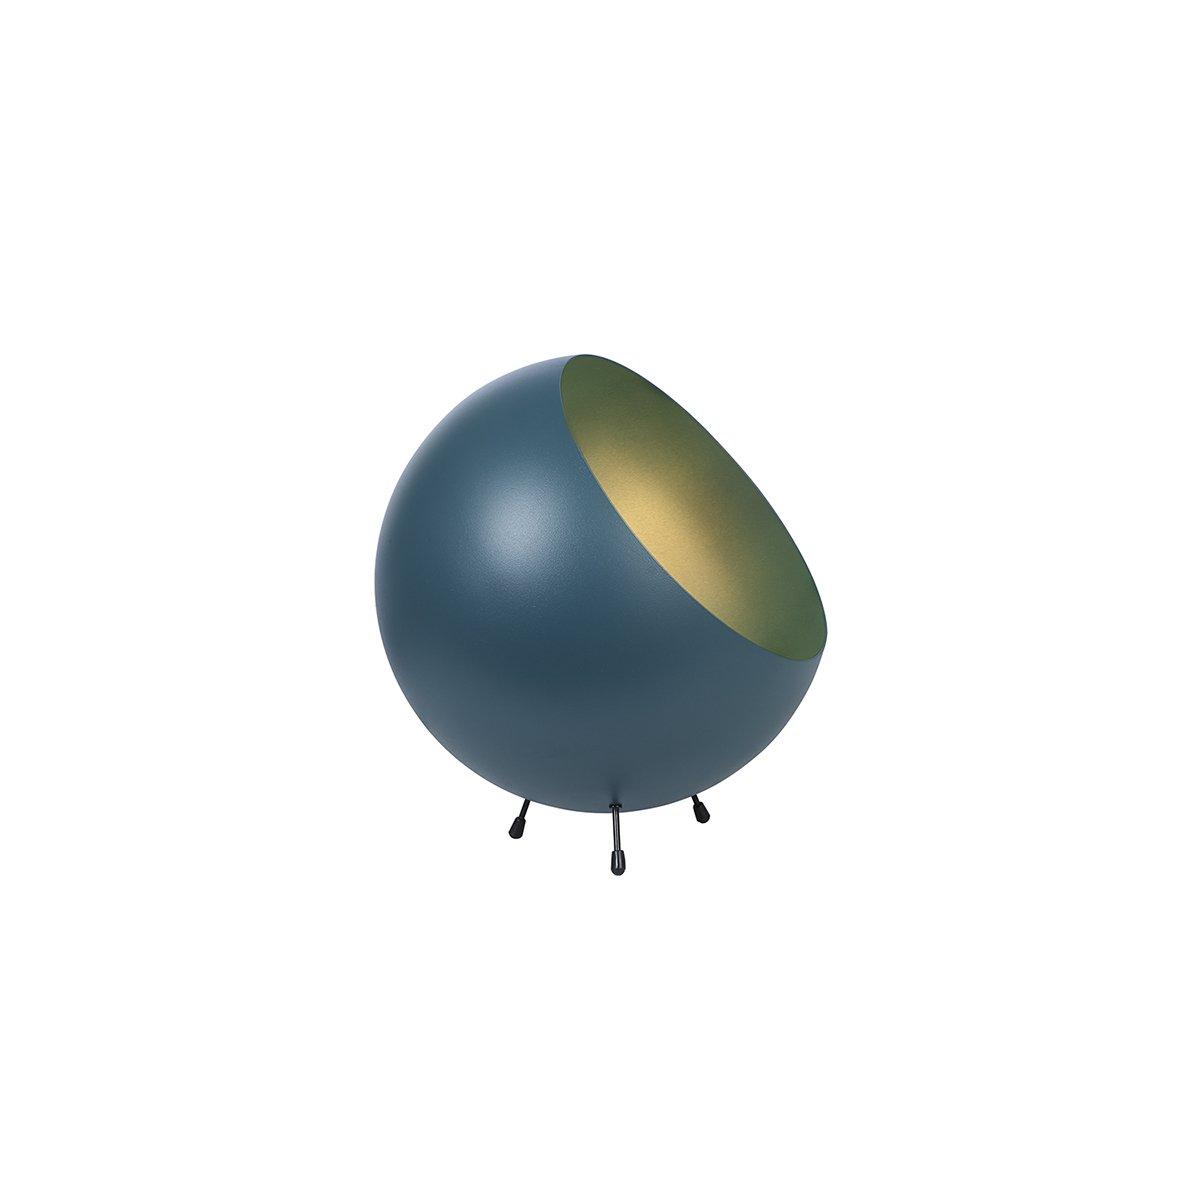 Sada 2 ks: Matná modrá stolní lampa XL Bell